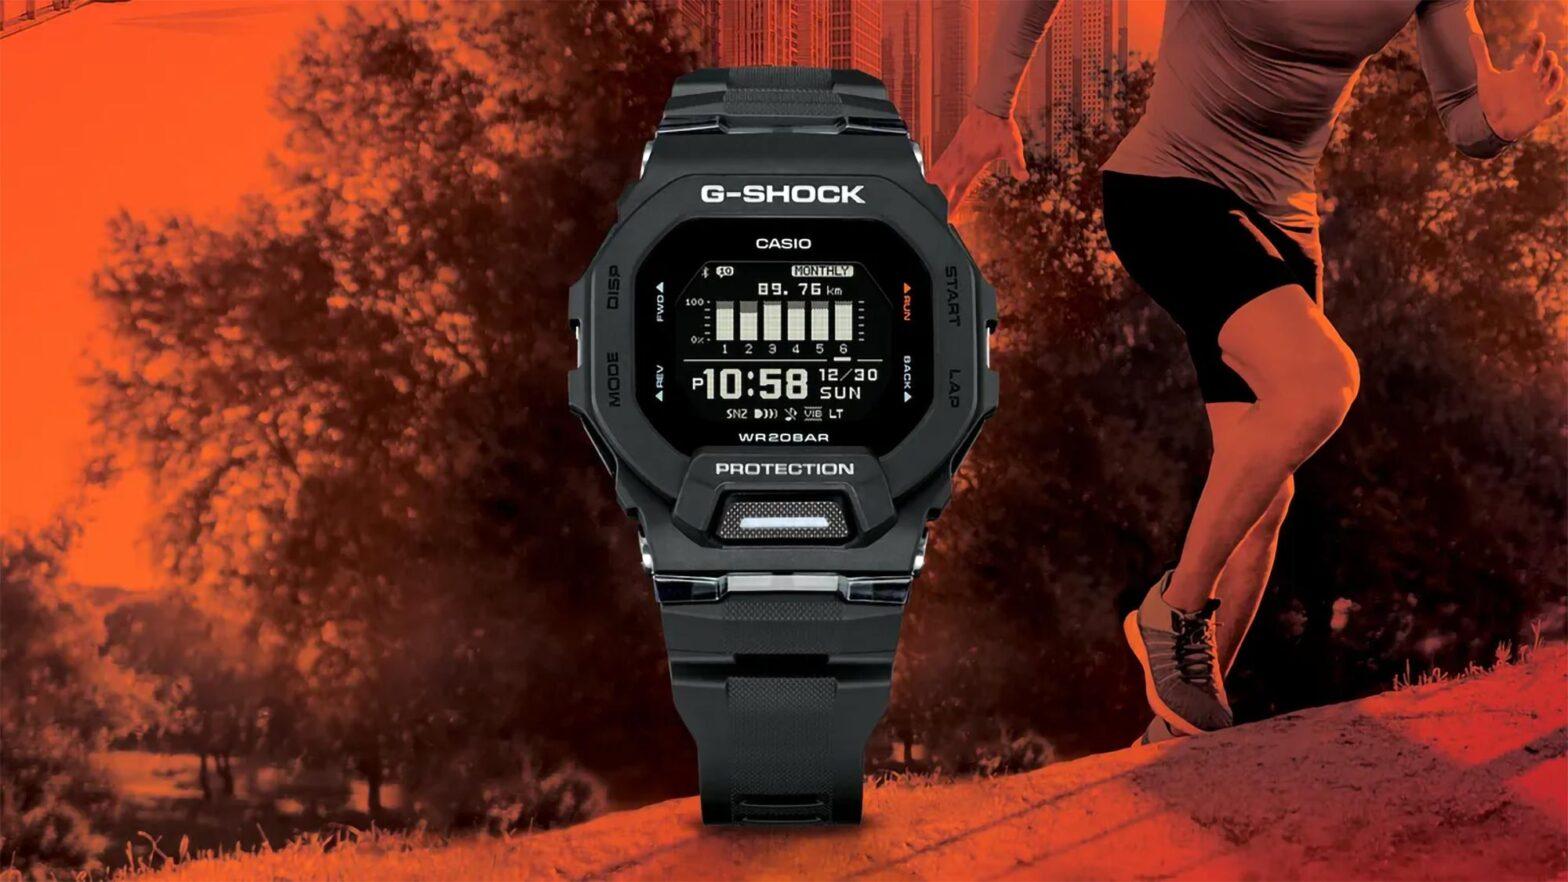 Casio G-Shock Move GBD200 Fitness Watch